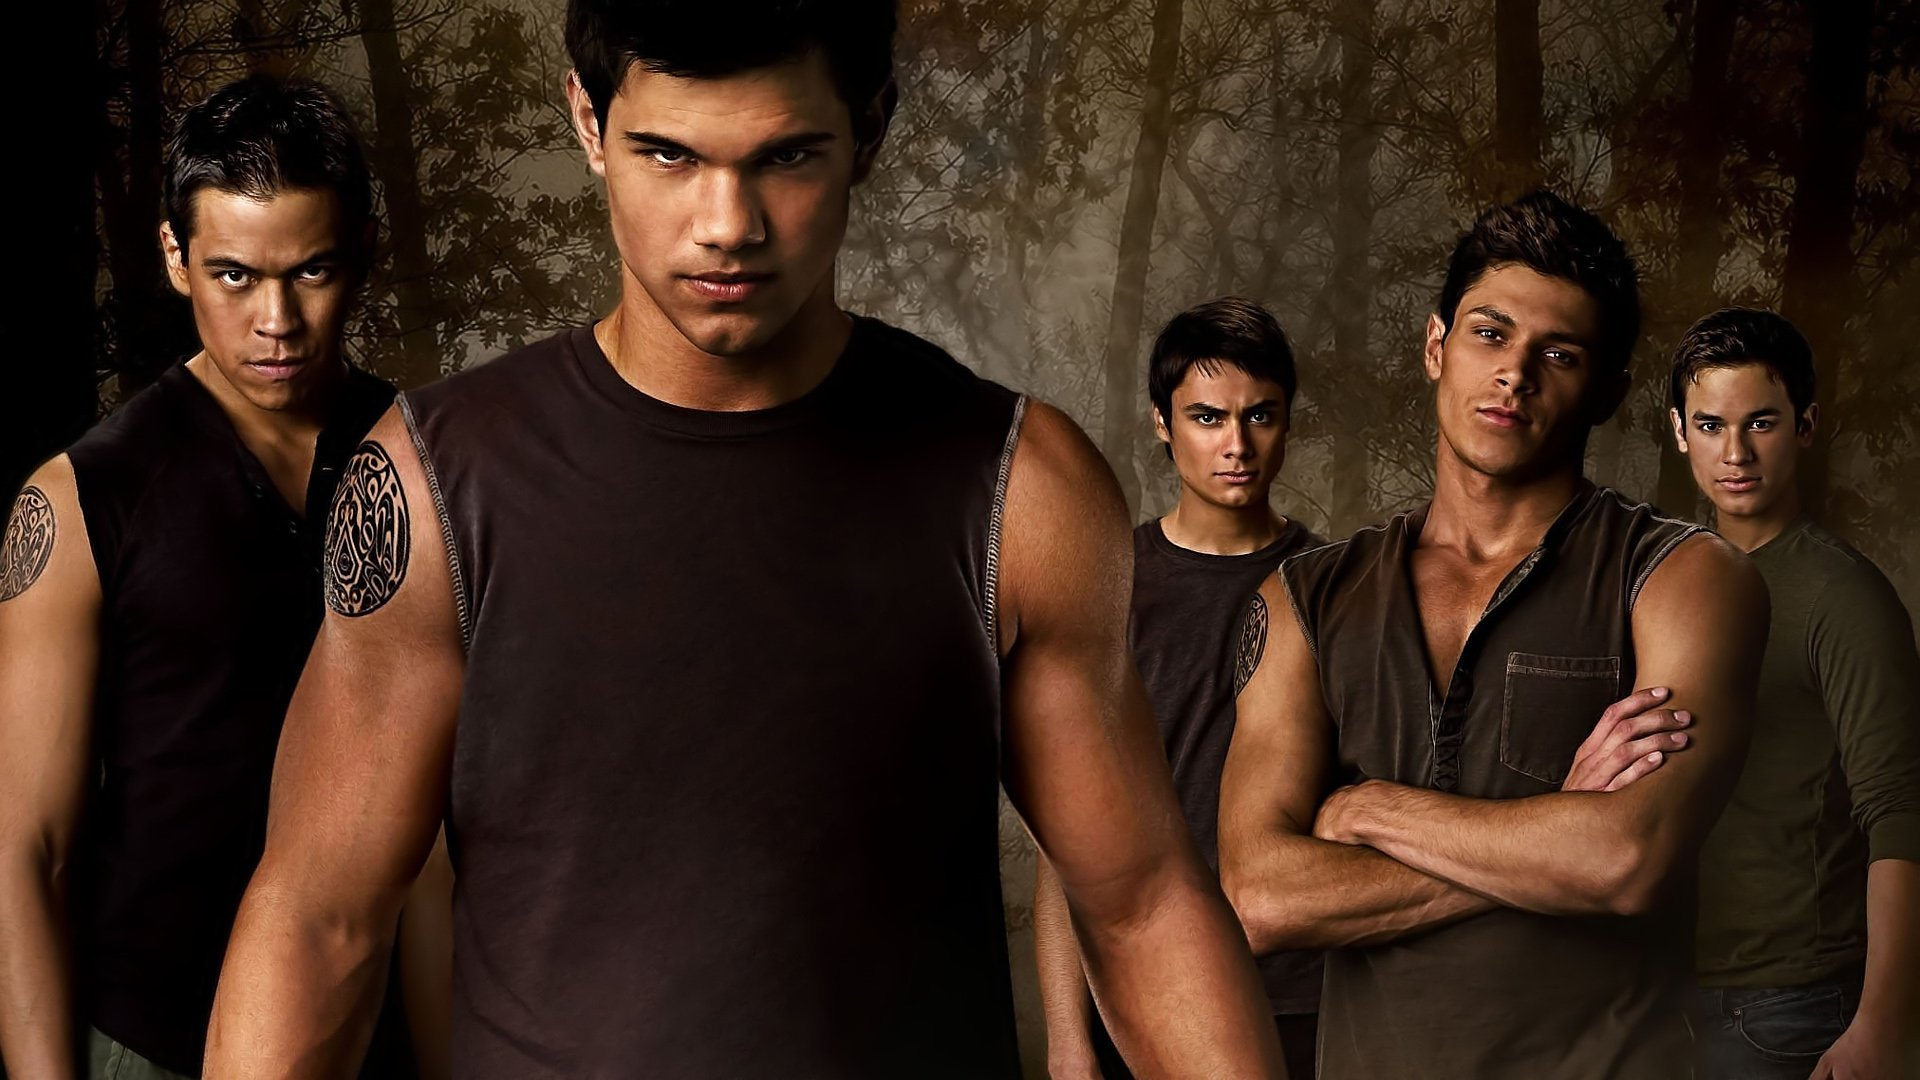 电影 - The Twilight Saga: New Moon  Jacob Black 壁纸